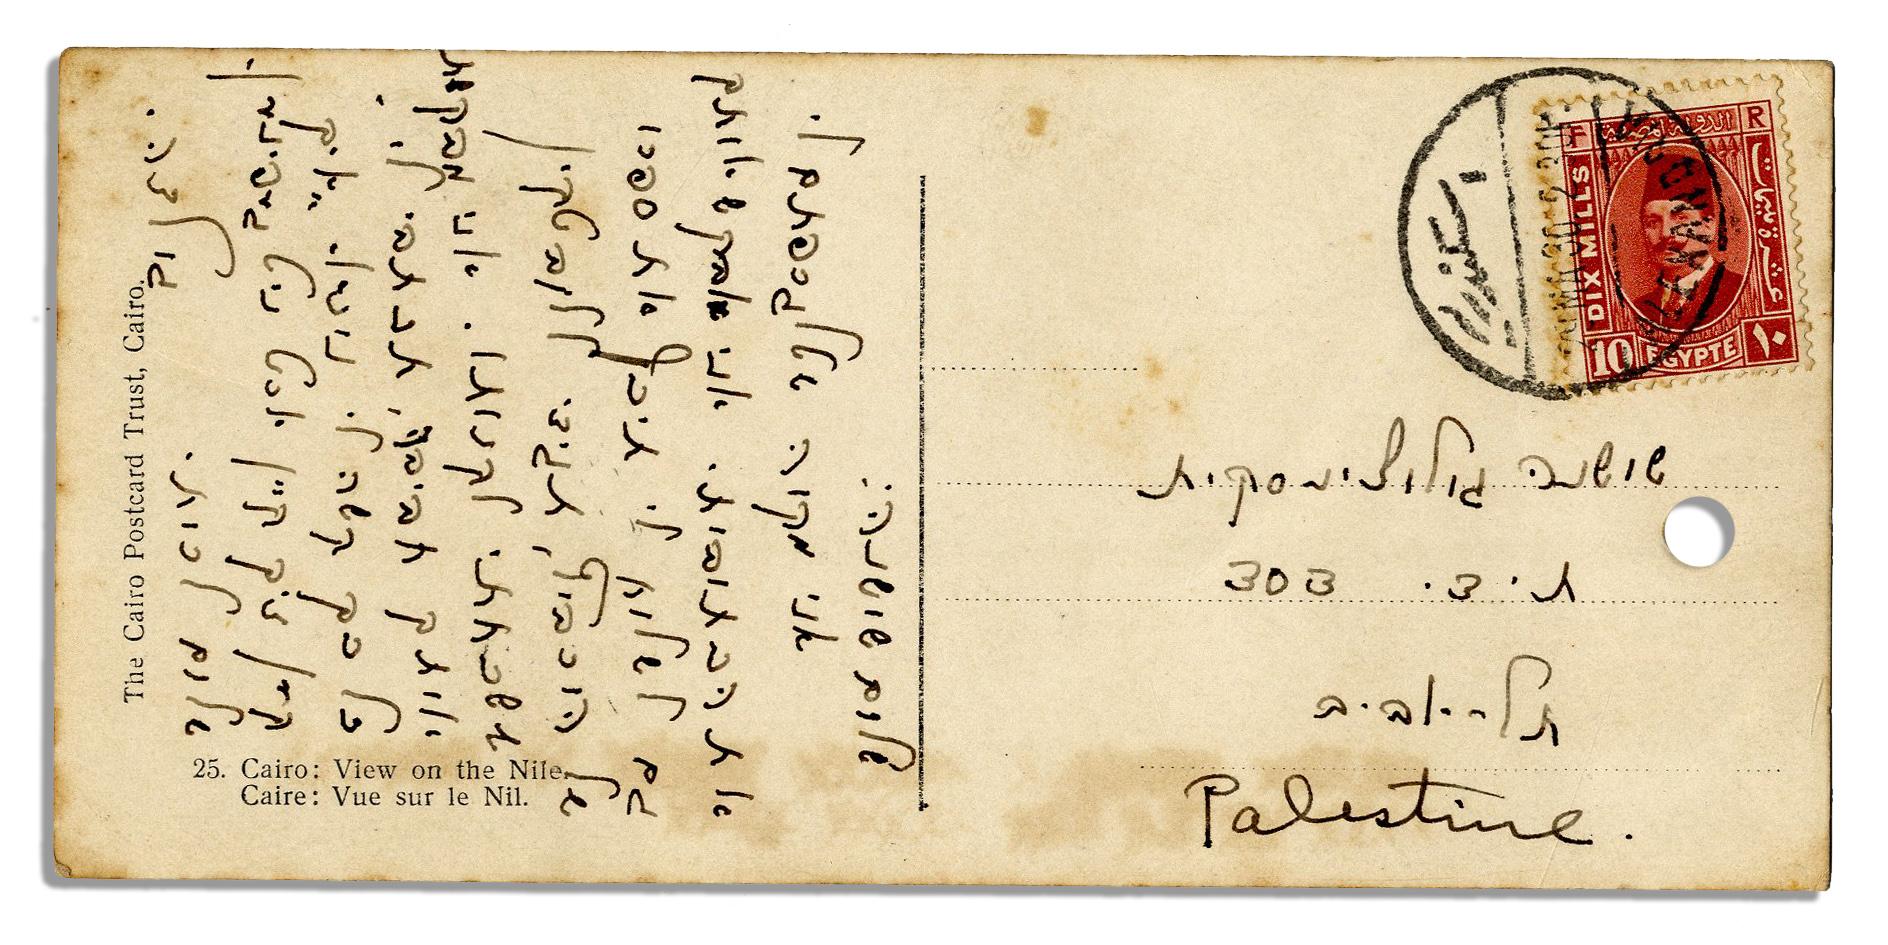 Judaica memorabilia Golda Meir Autograph Note Signed Upon a Postcard to Palestine